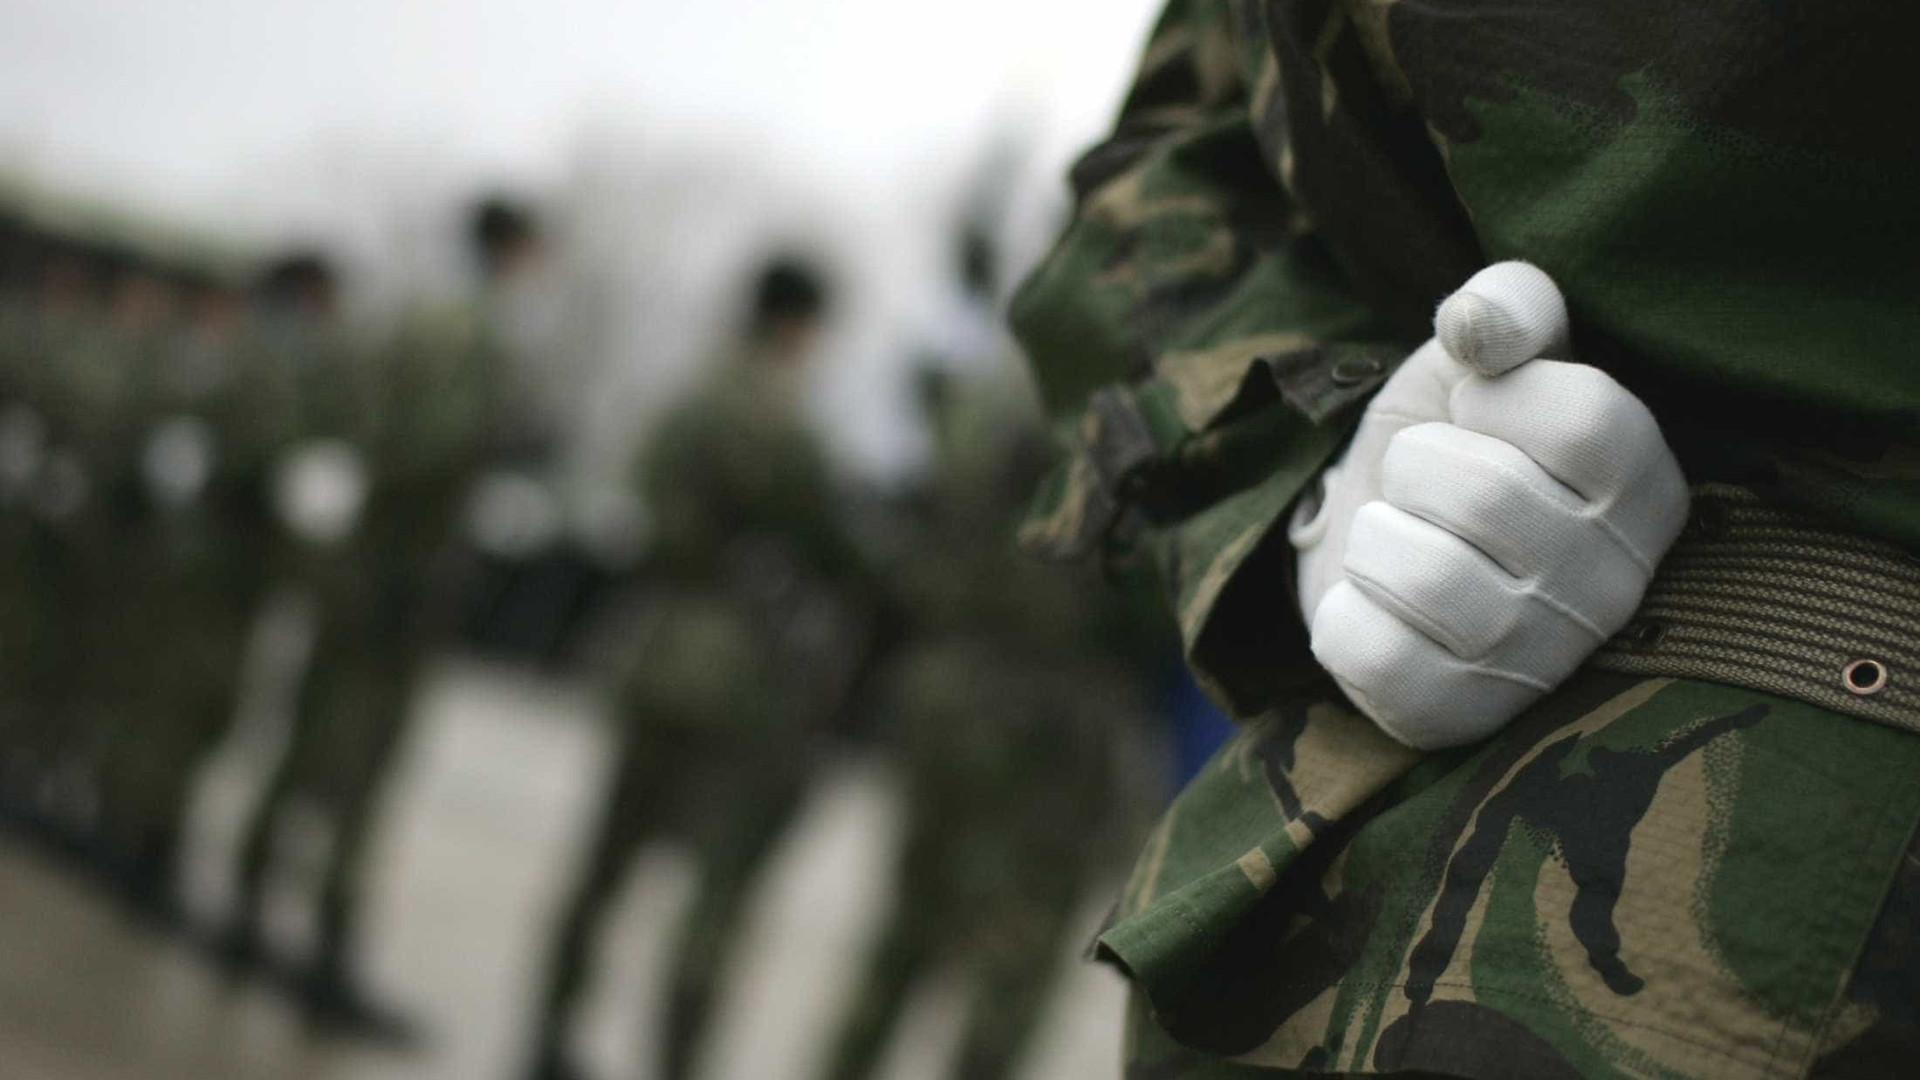 Oficial do Exército acusado pelo MP de peculato de uso e abuso de poder